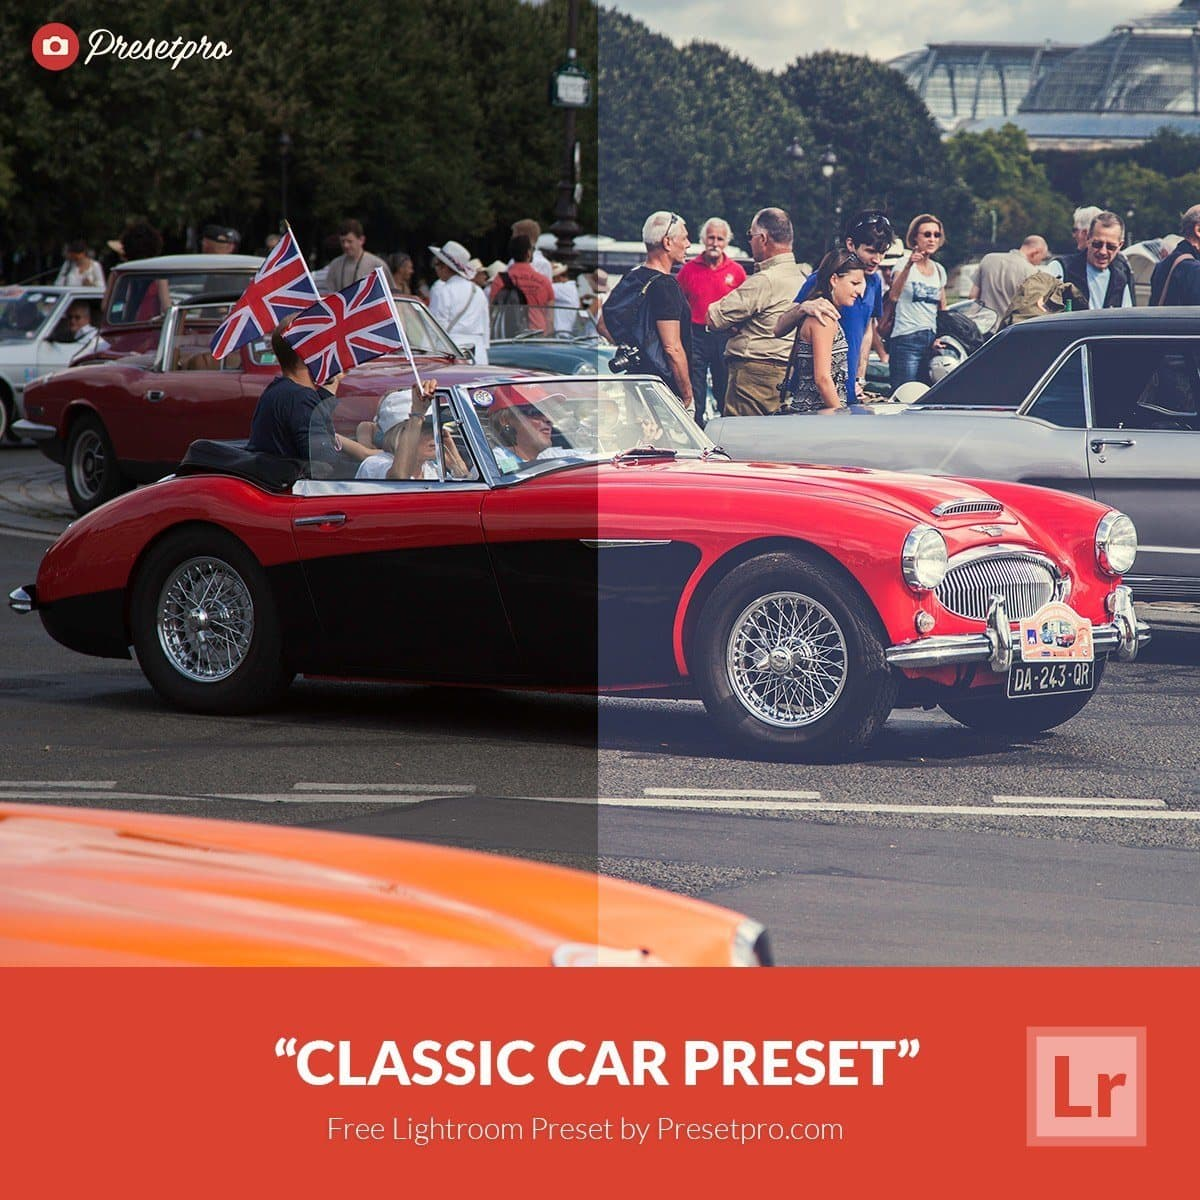 Free-Lightroom-Preset-Classic-Car